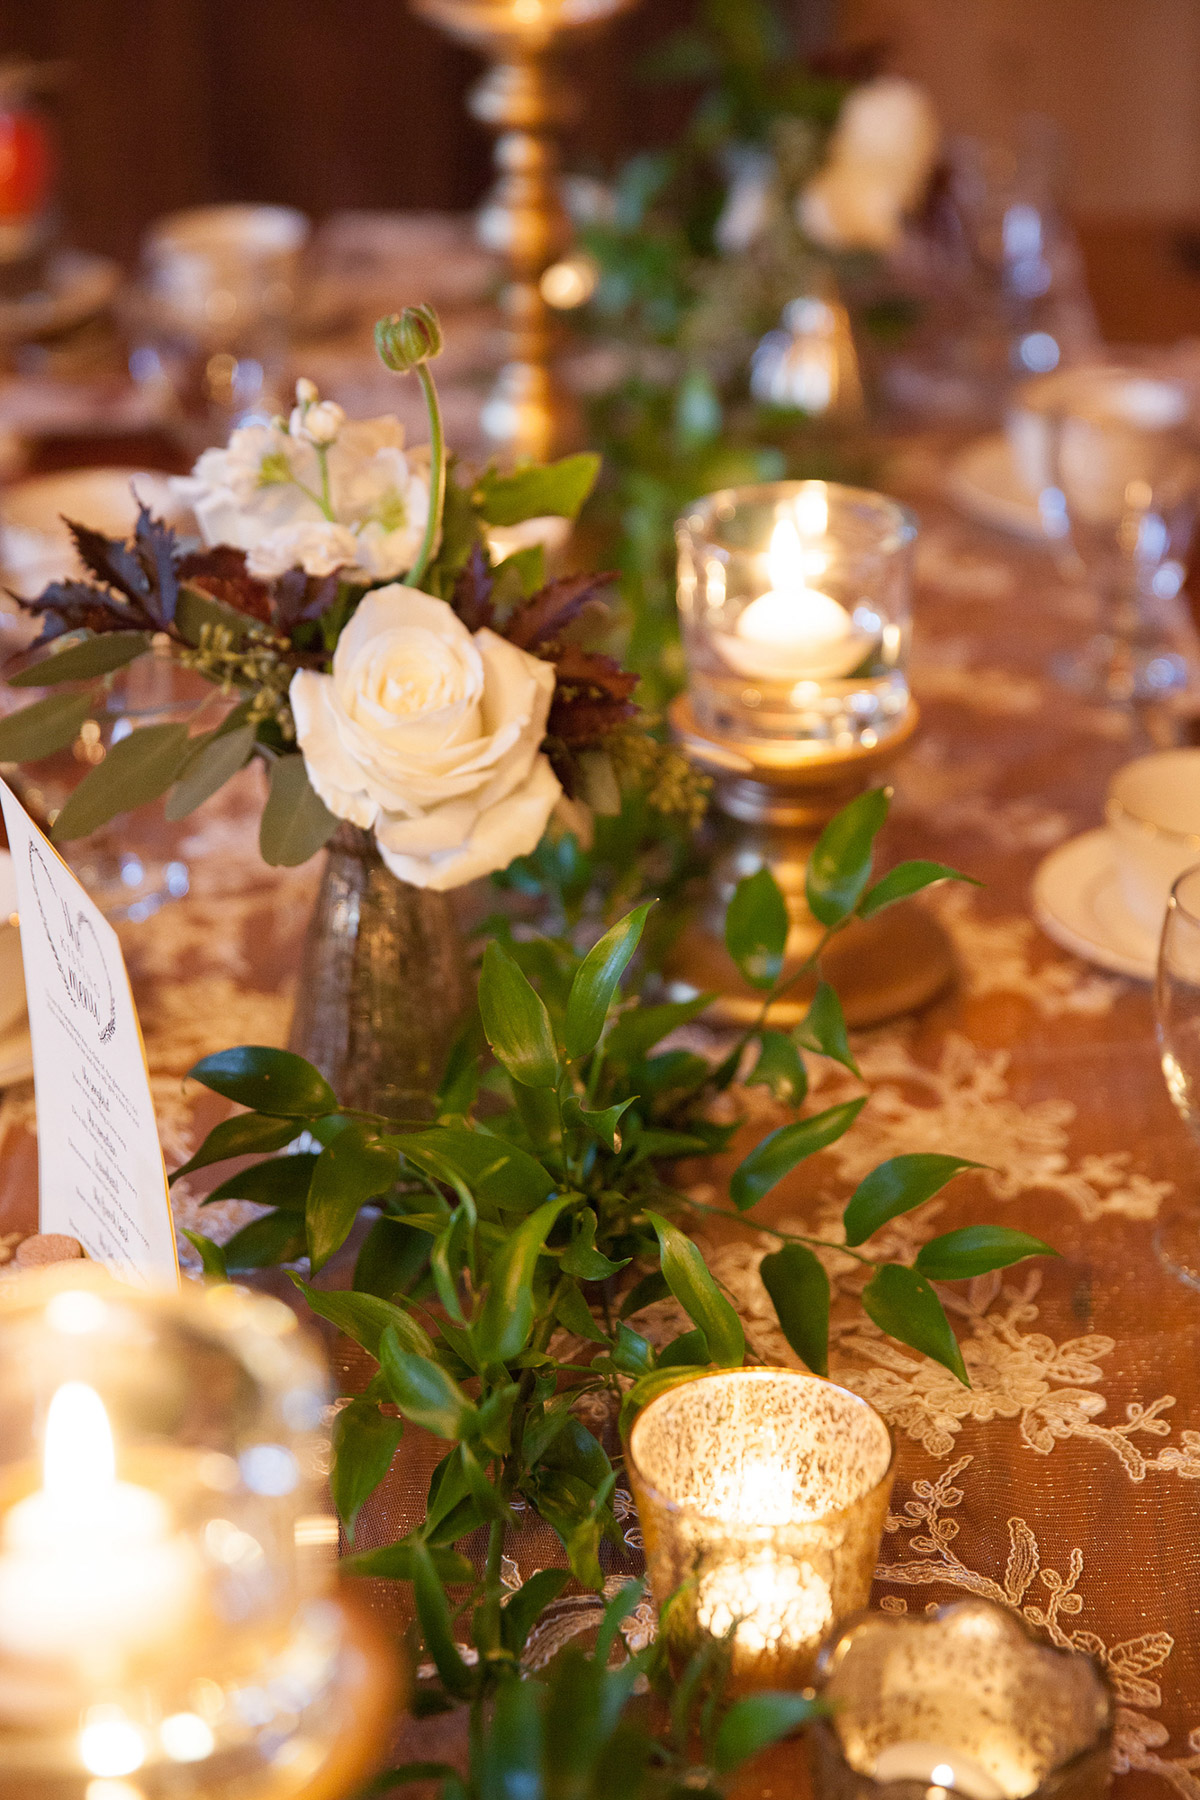 gemini-photography-vineyard-bride-swish-list-honsberger-estates-jordan-wedding-12.jpg